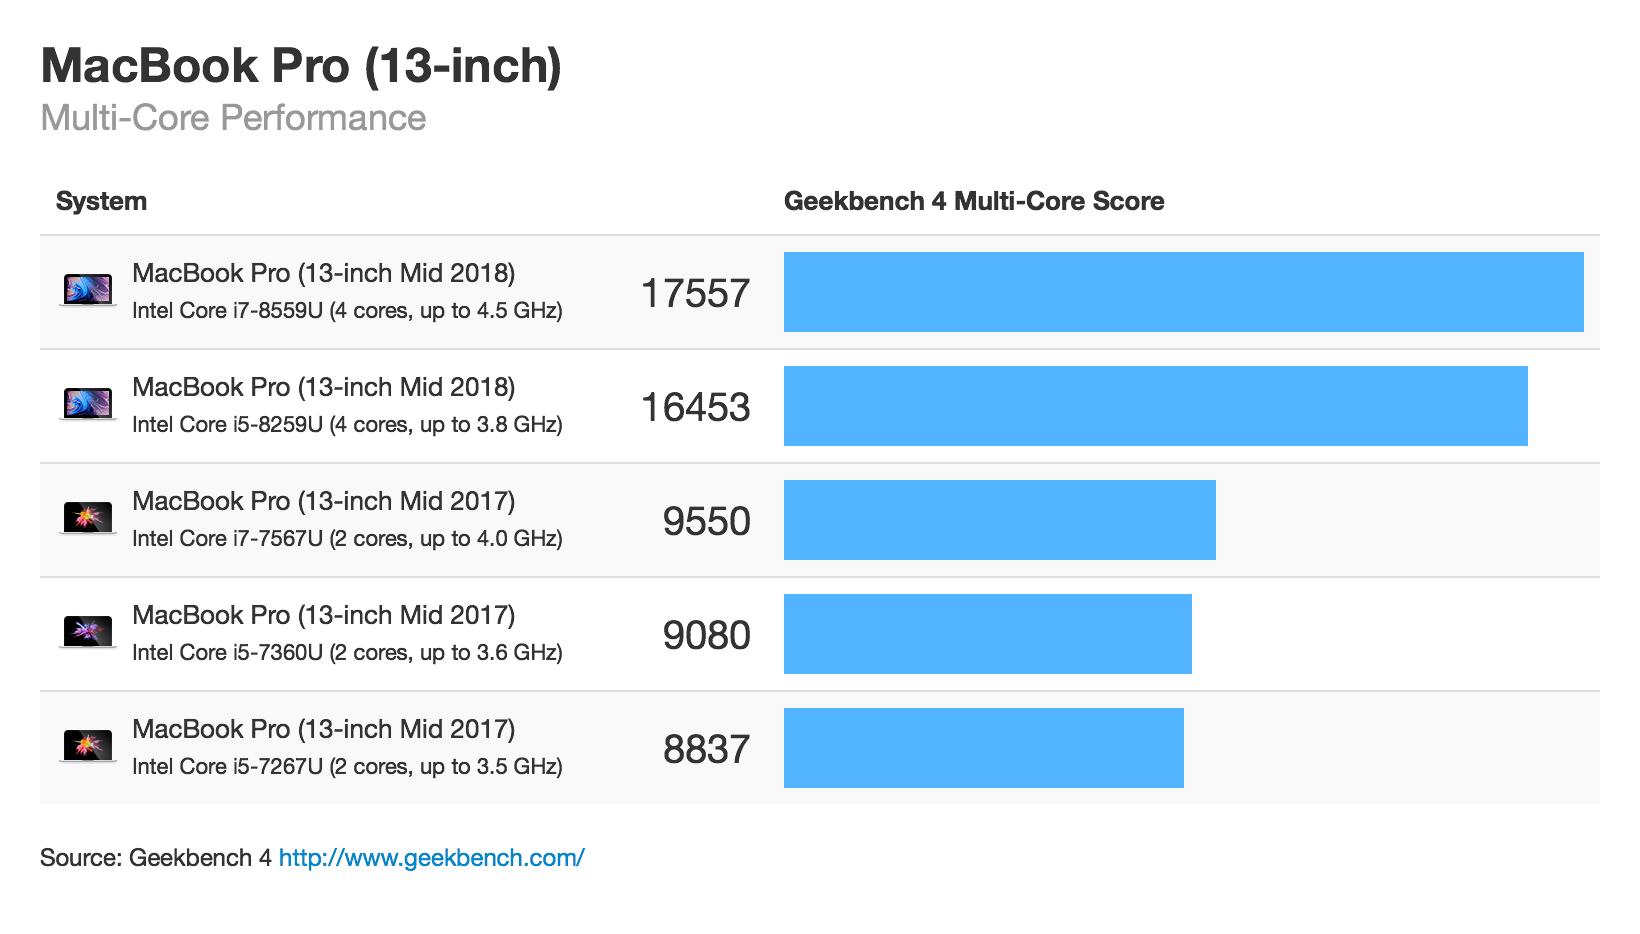 macbook pro 13 mid 2018 multicore